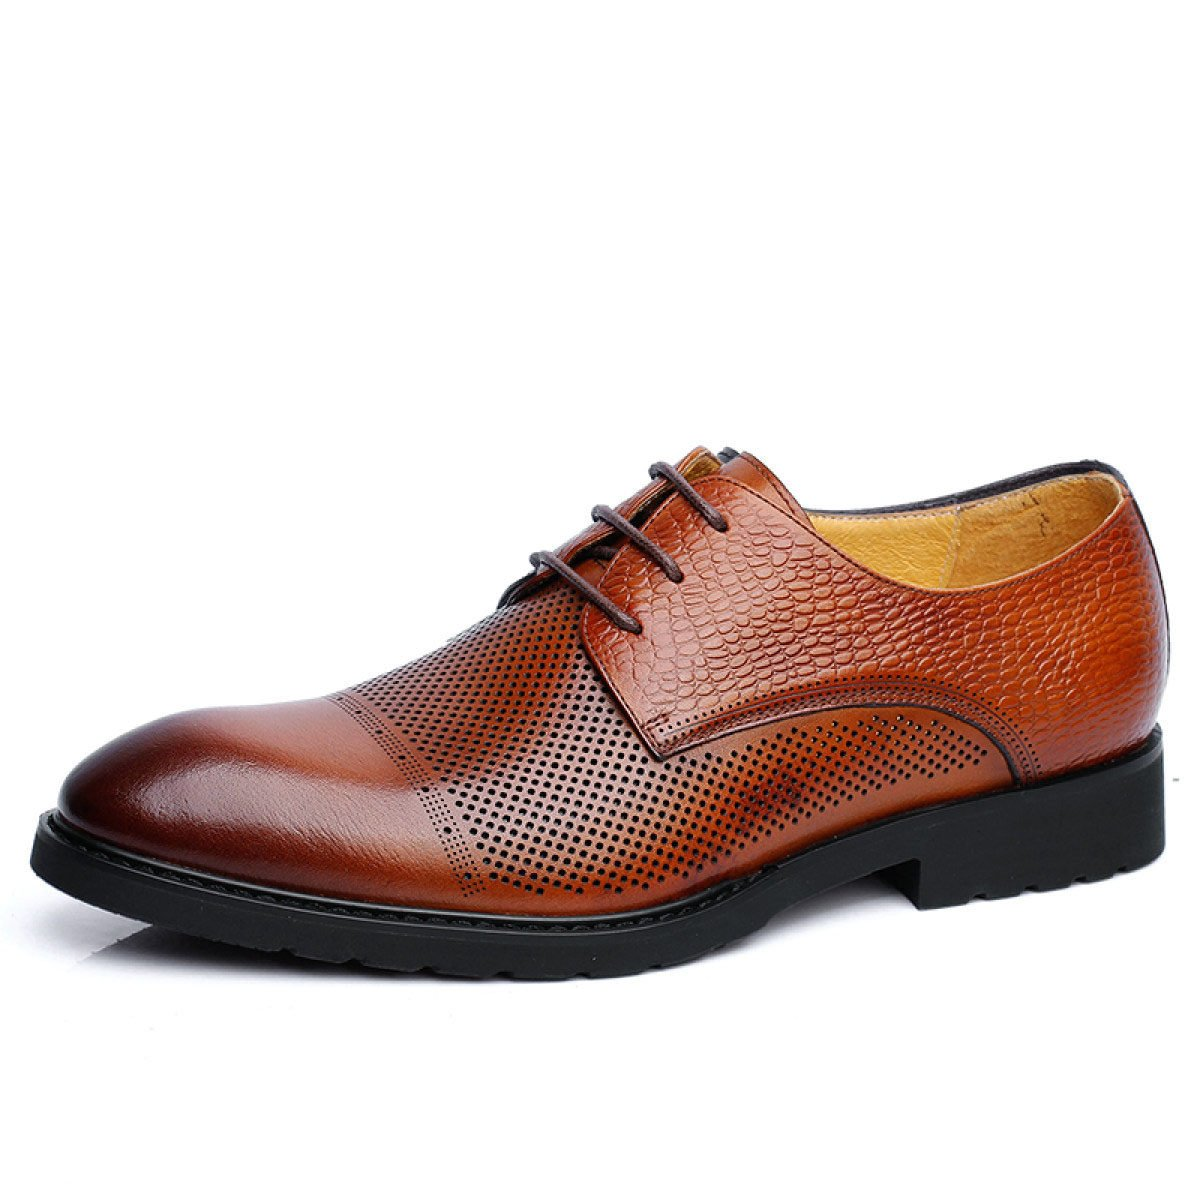 NBWE Sandalias De Negocios Para Hombres Zapatos De Vestir Huecos De Cuero Zapatos De Agujeros Transpirables 42|marrón